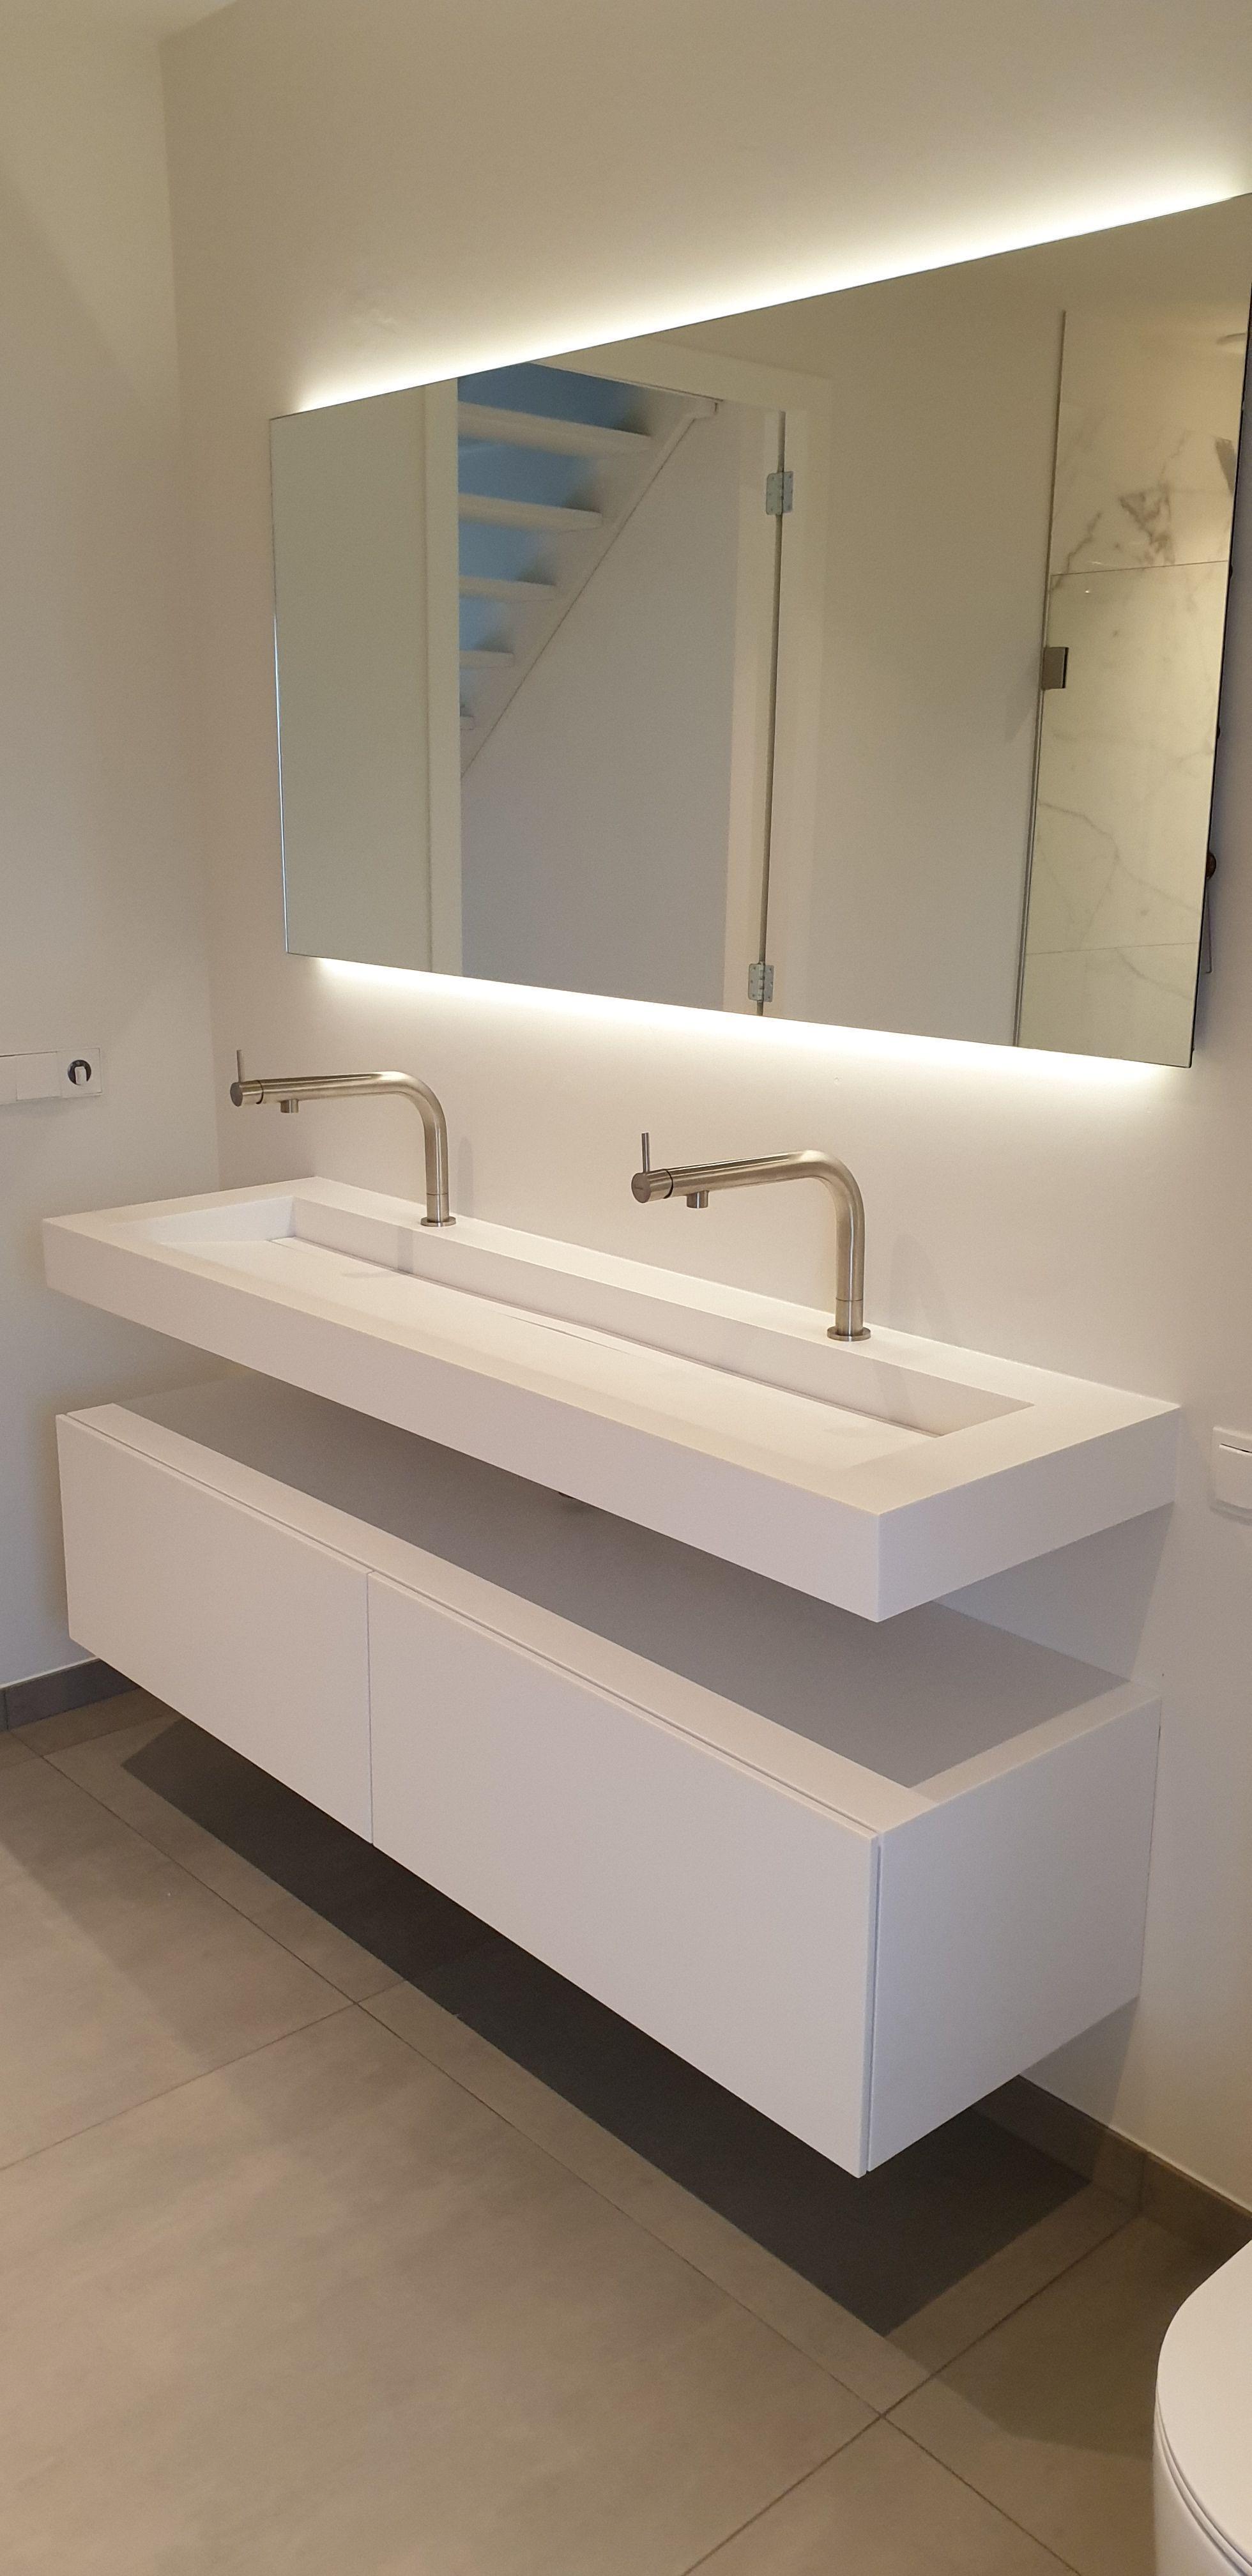 Tiz Design Kwaliteits Badkamermeubels Solid Surface Badkamermeubels Spiegel Badkamer Ontwerpers